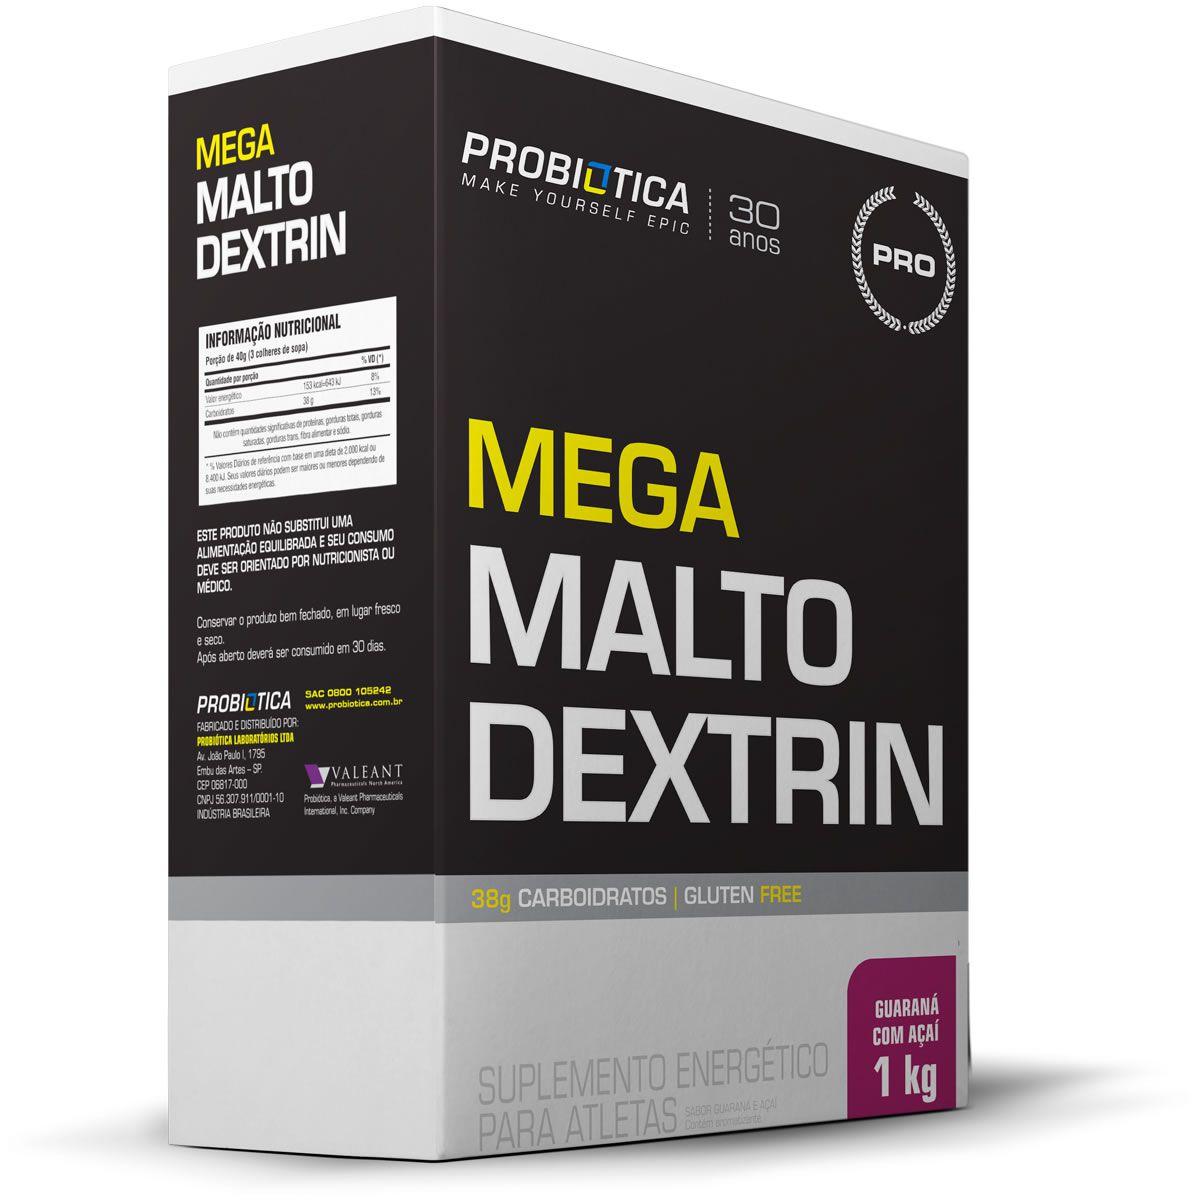 Mega Maltodextrin (1kg) Probiótica